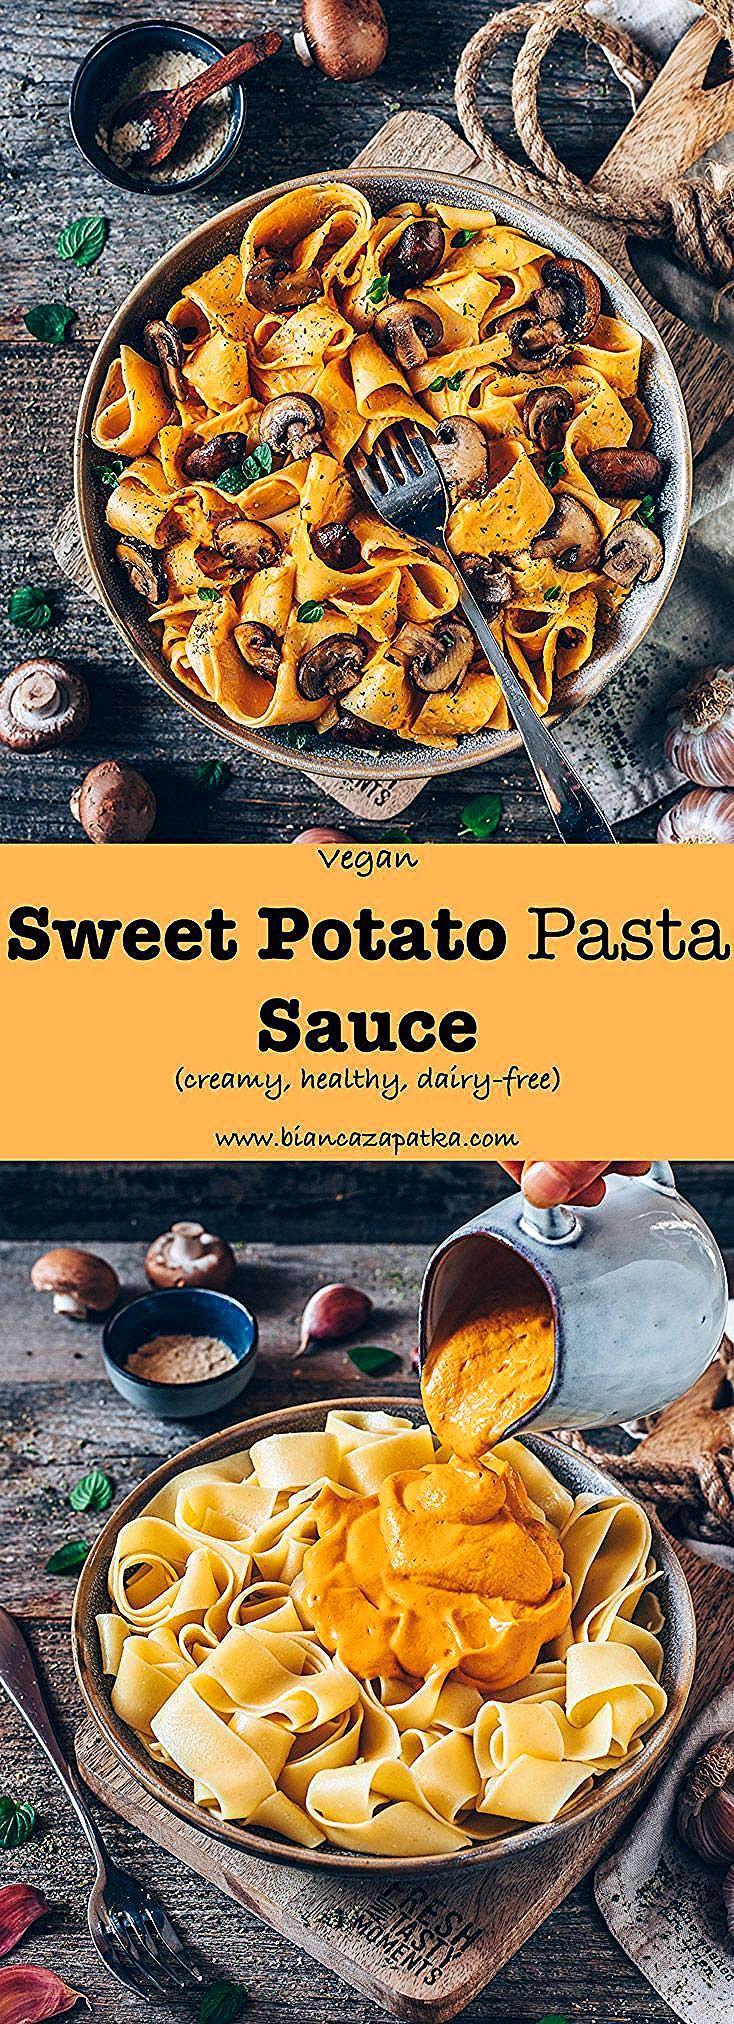 Vegan Sweet Potato Pasta Sauce (creamy, cheesy) #bianca #cheesy #creamy #fitness #fitness ideas #fit...